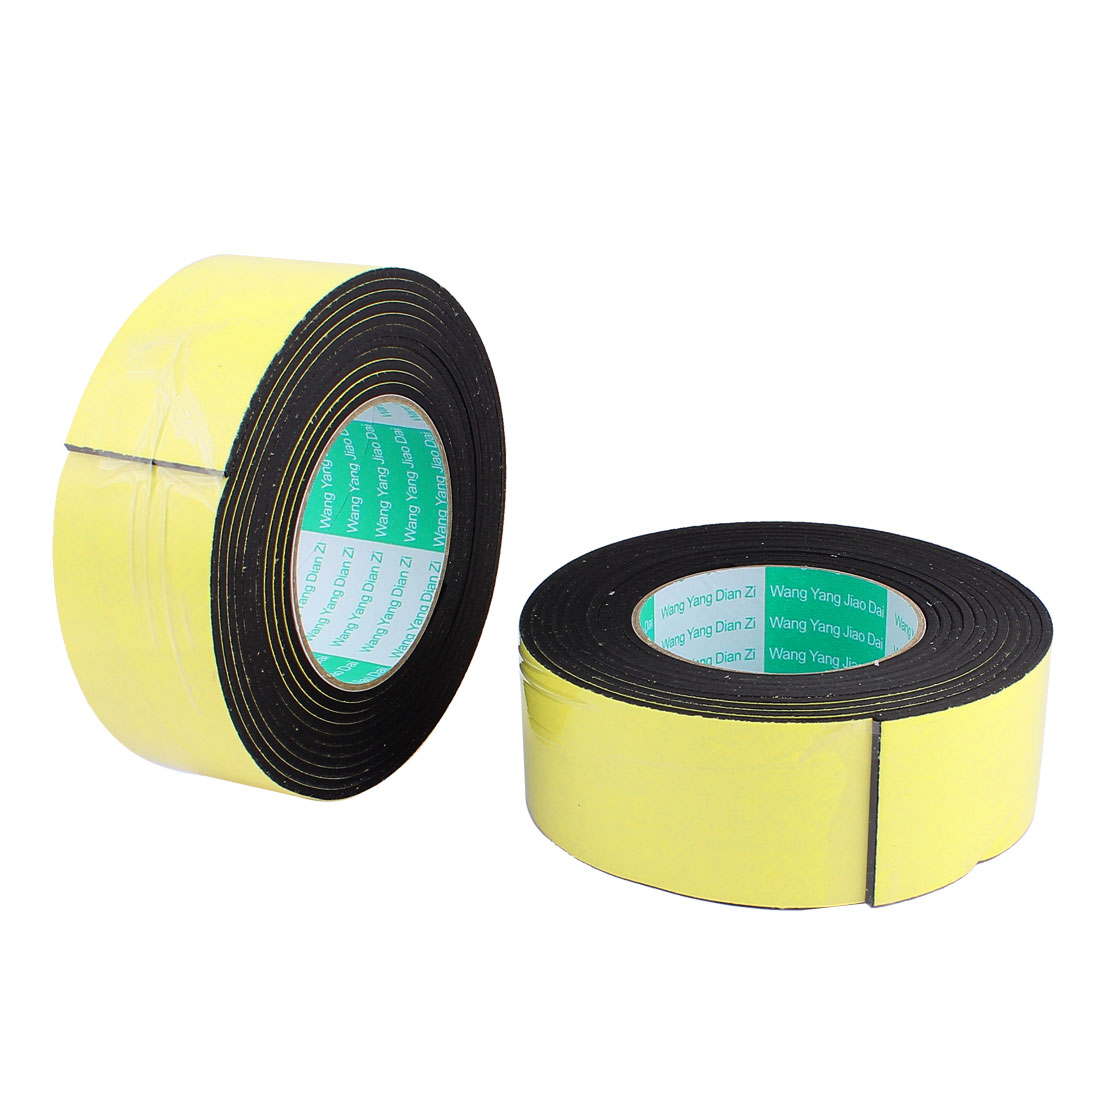 2 Pcs 5CM Width 4M Length 3MM Thick Single Sided Sealing Shockproof Sponge Tape